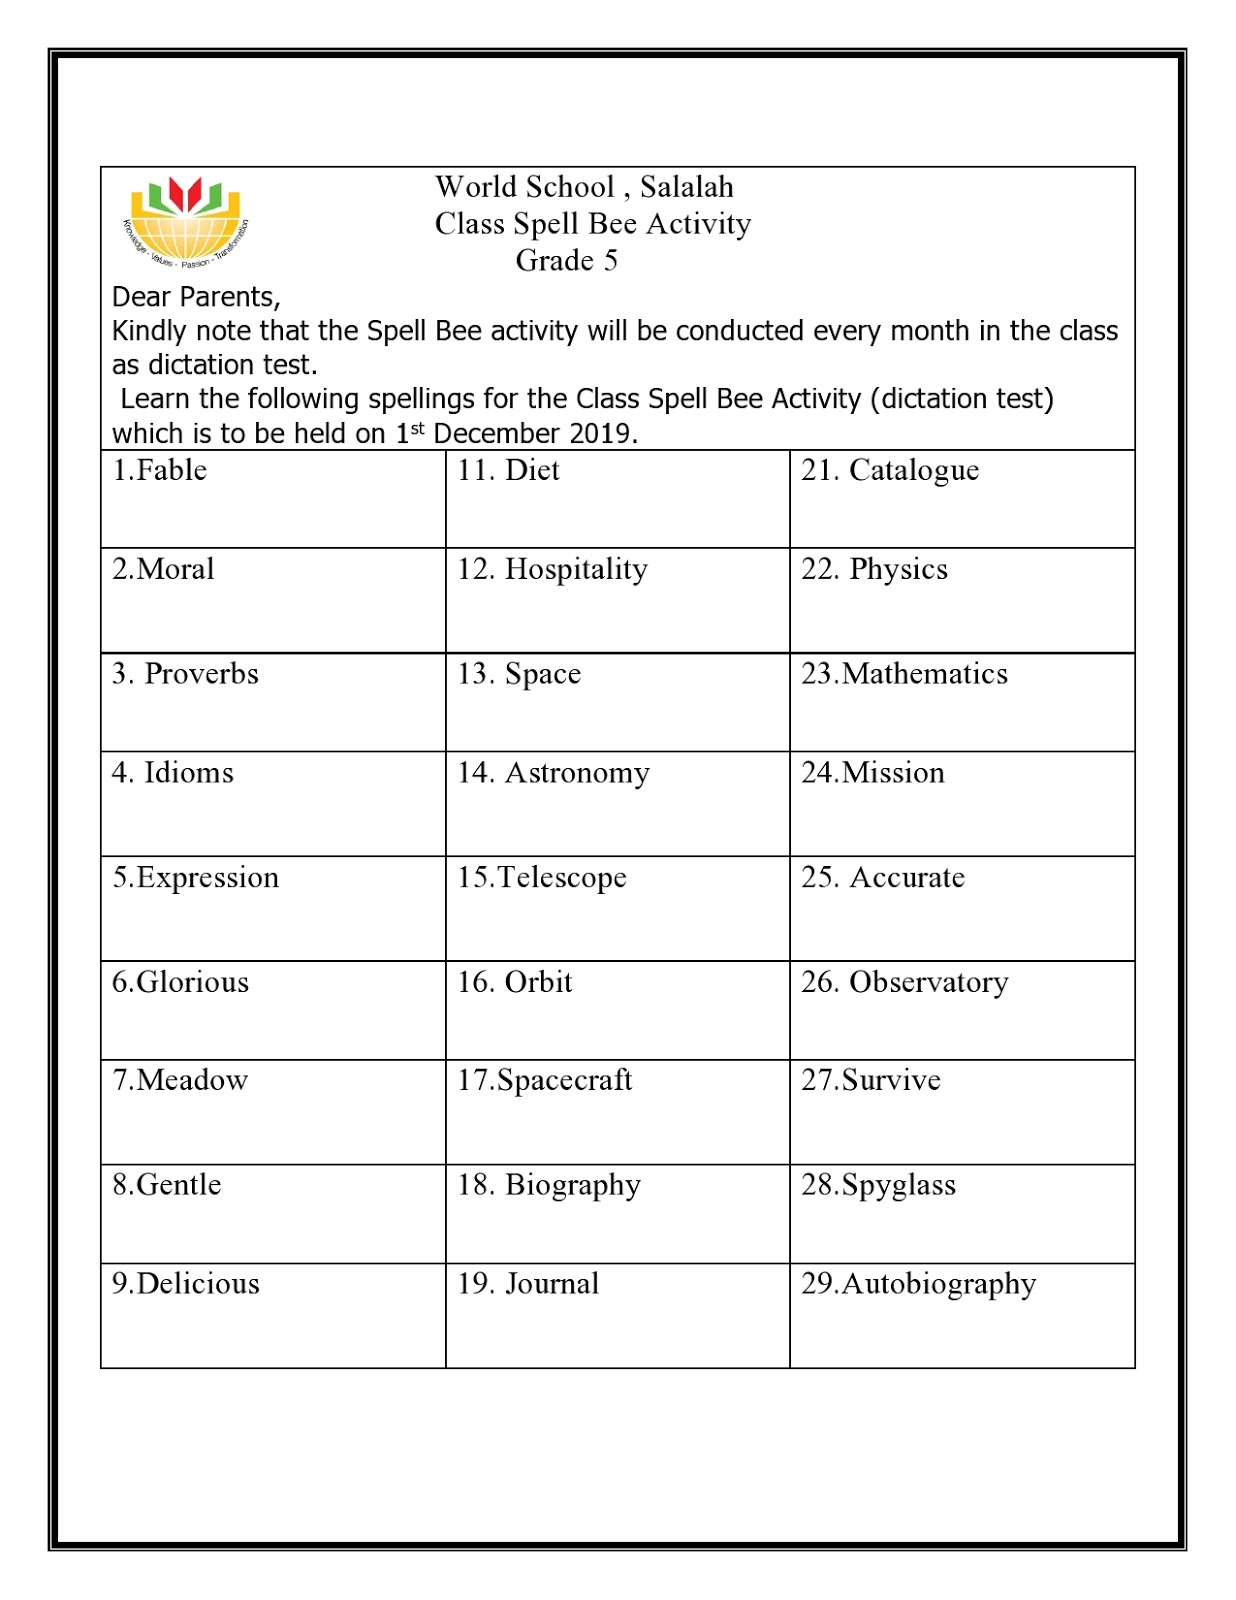 hight resolution of WORLD SCHOOL OMAN: Homework for Grade 5 as on 12-11-2019